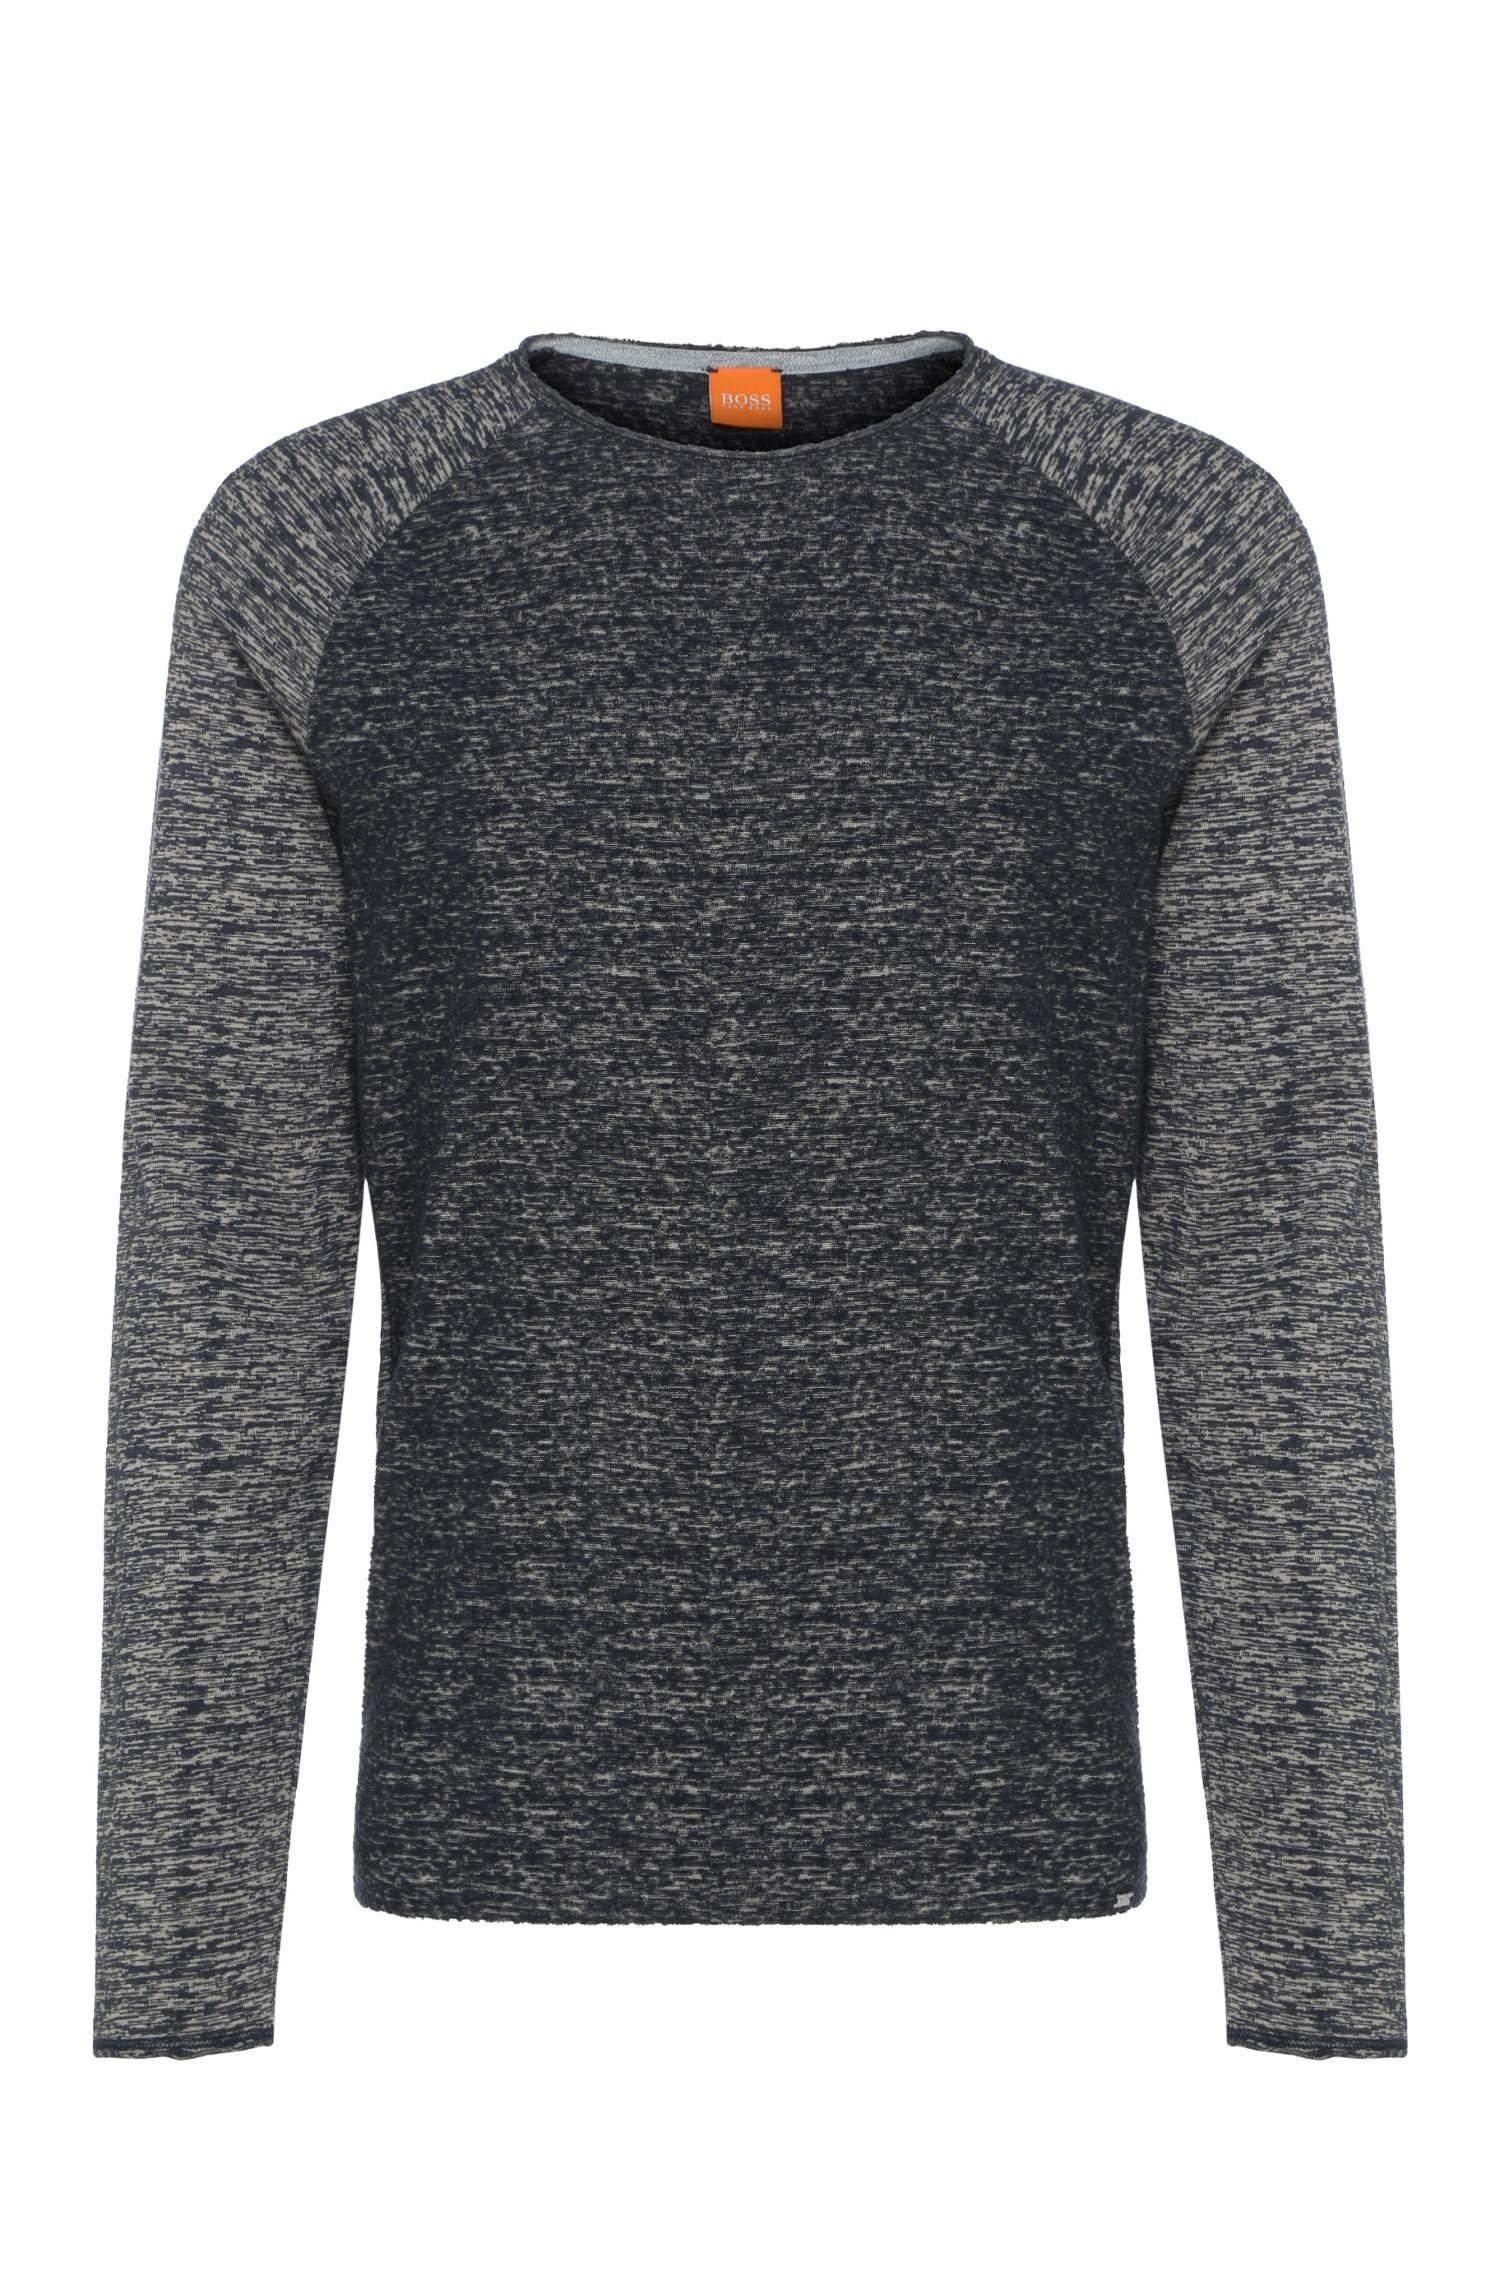 'Welles' | Cotton Blend Melange Sweatshirt